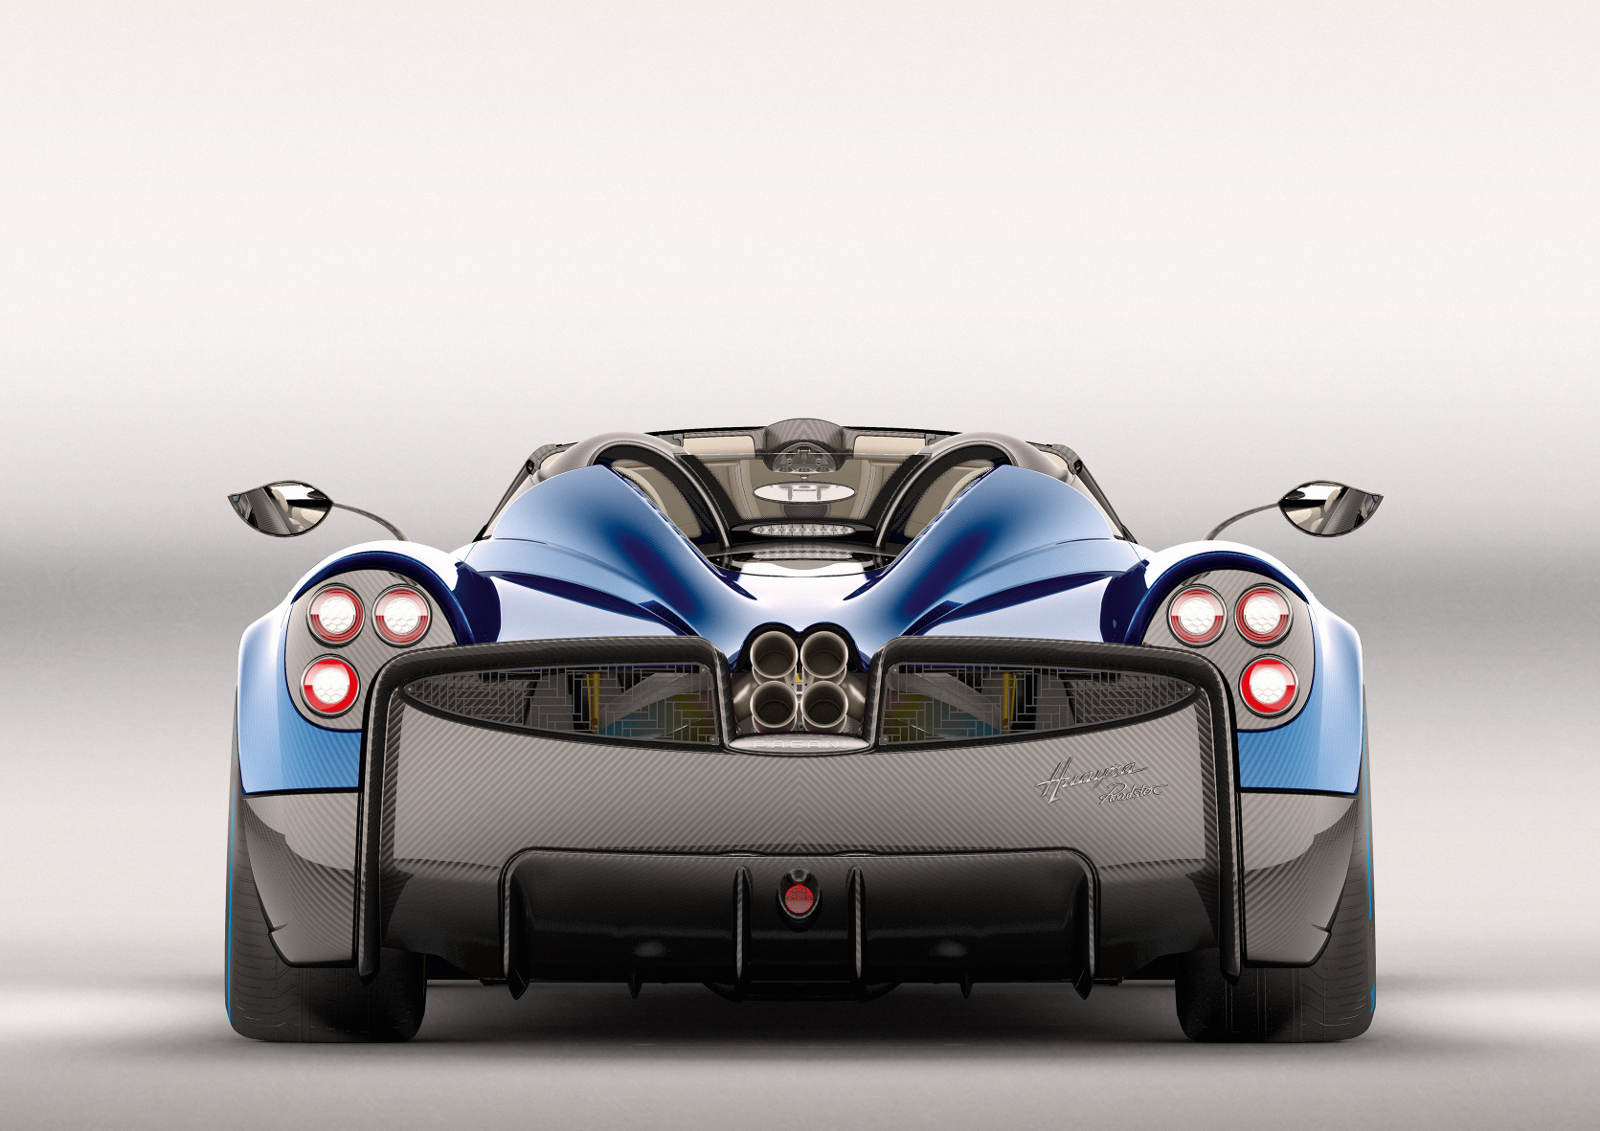 Oficial: Pagani Huayra Roadster, 764 caballos y solo 100 unidades